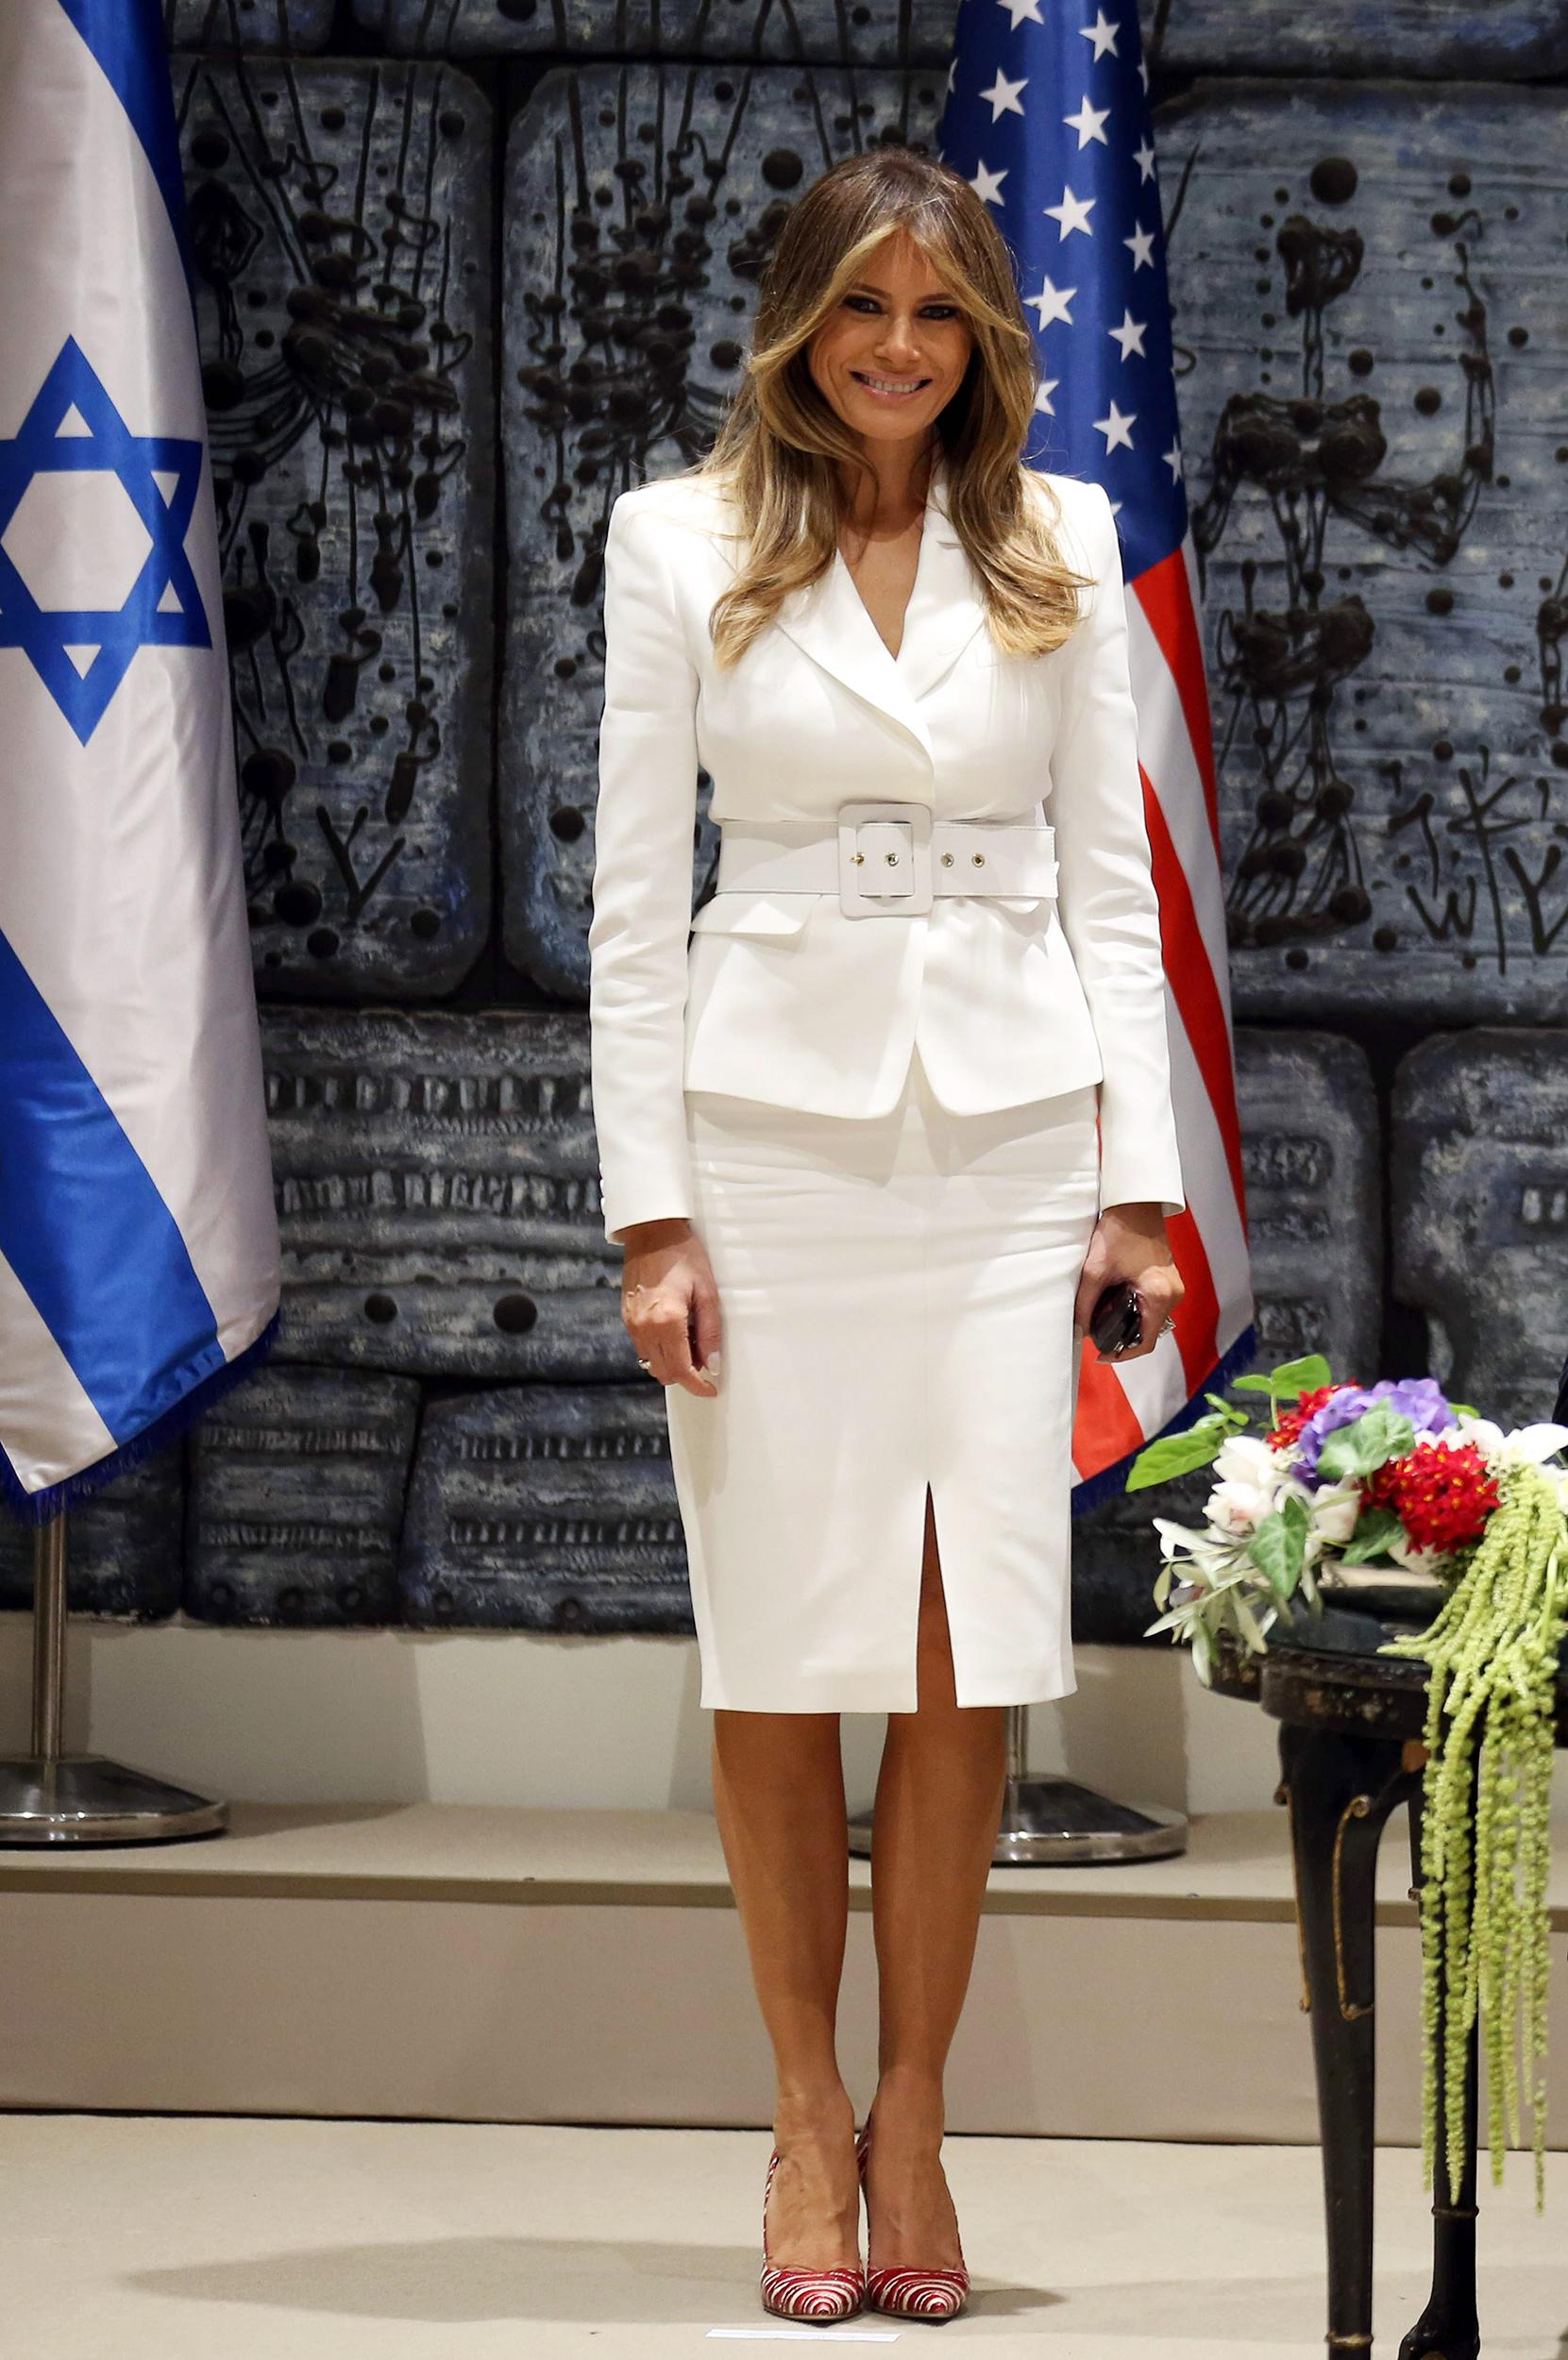 da07b756ce5c Melania Trump's first lady style